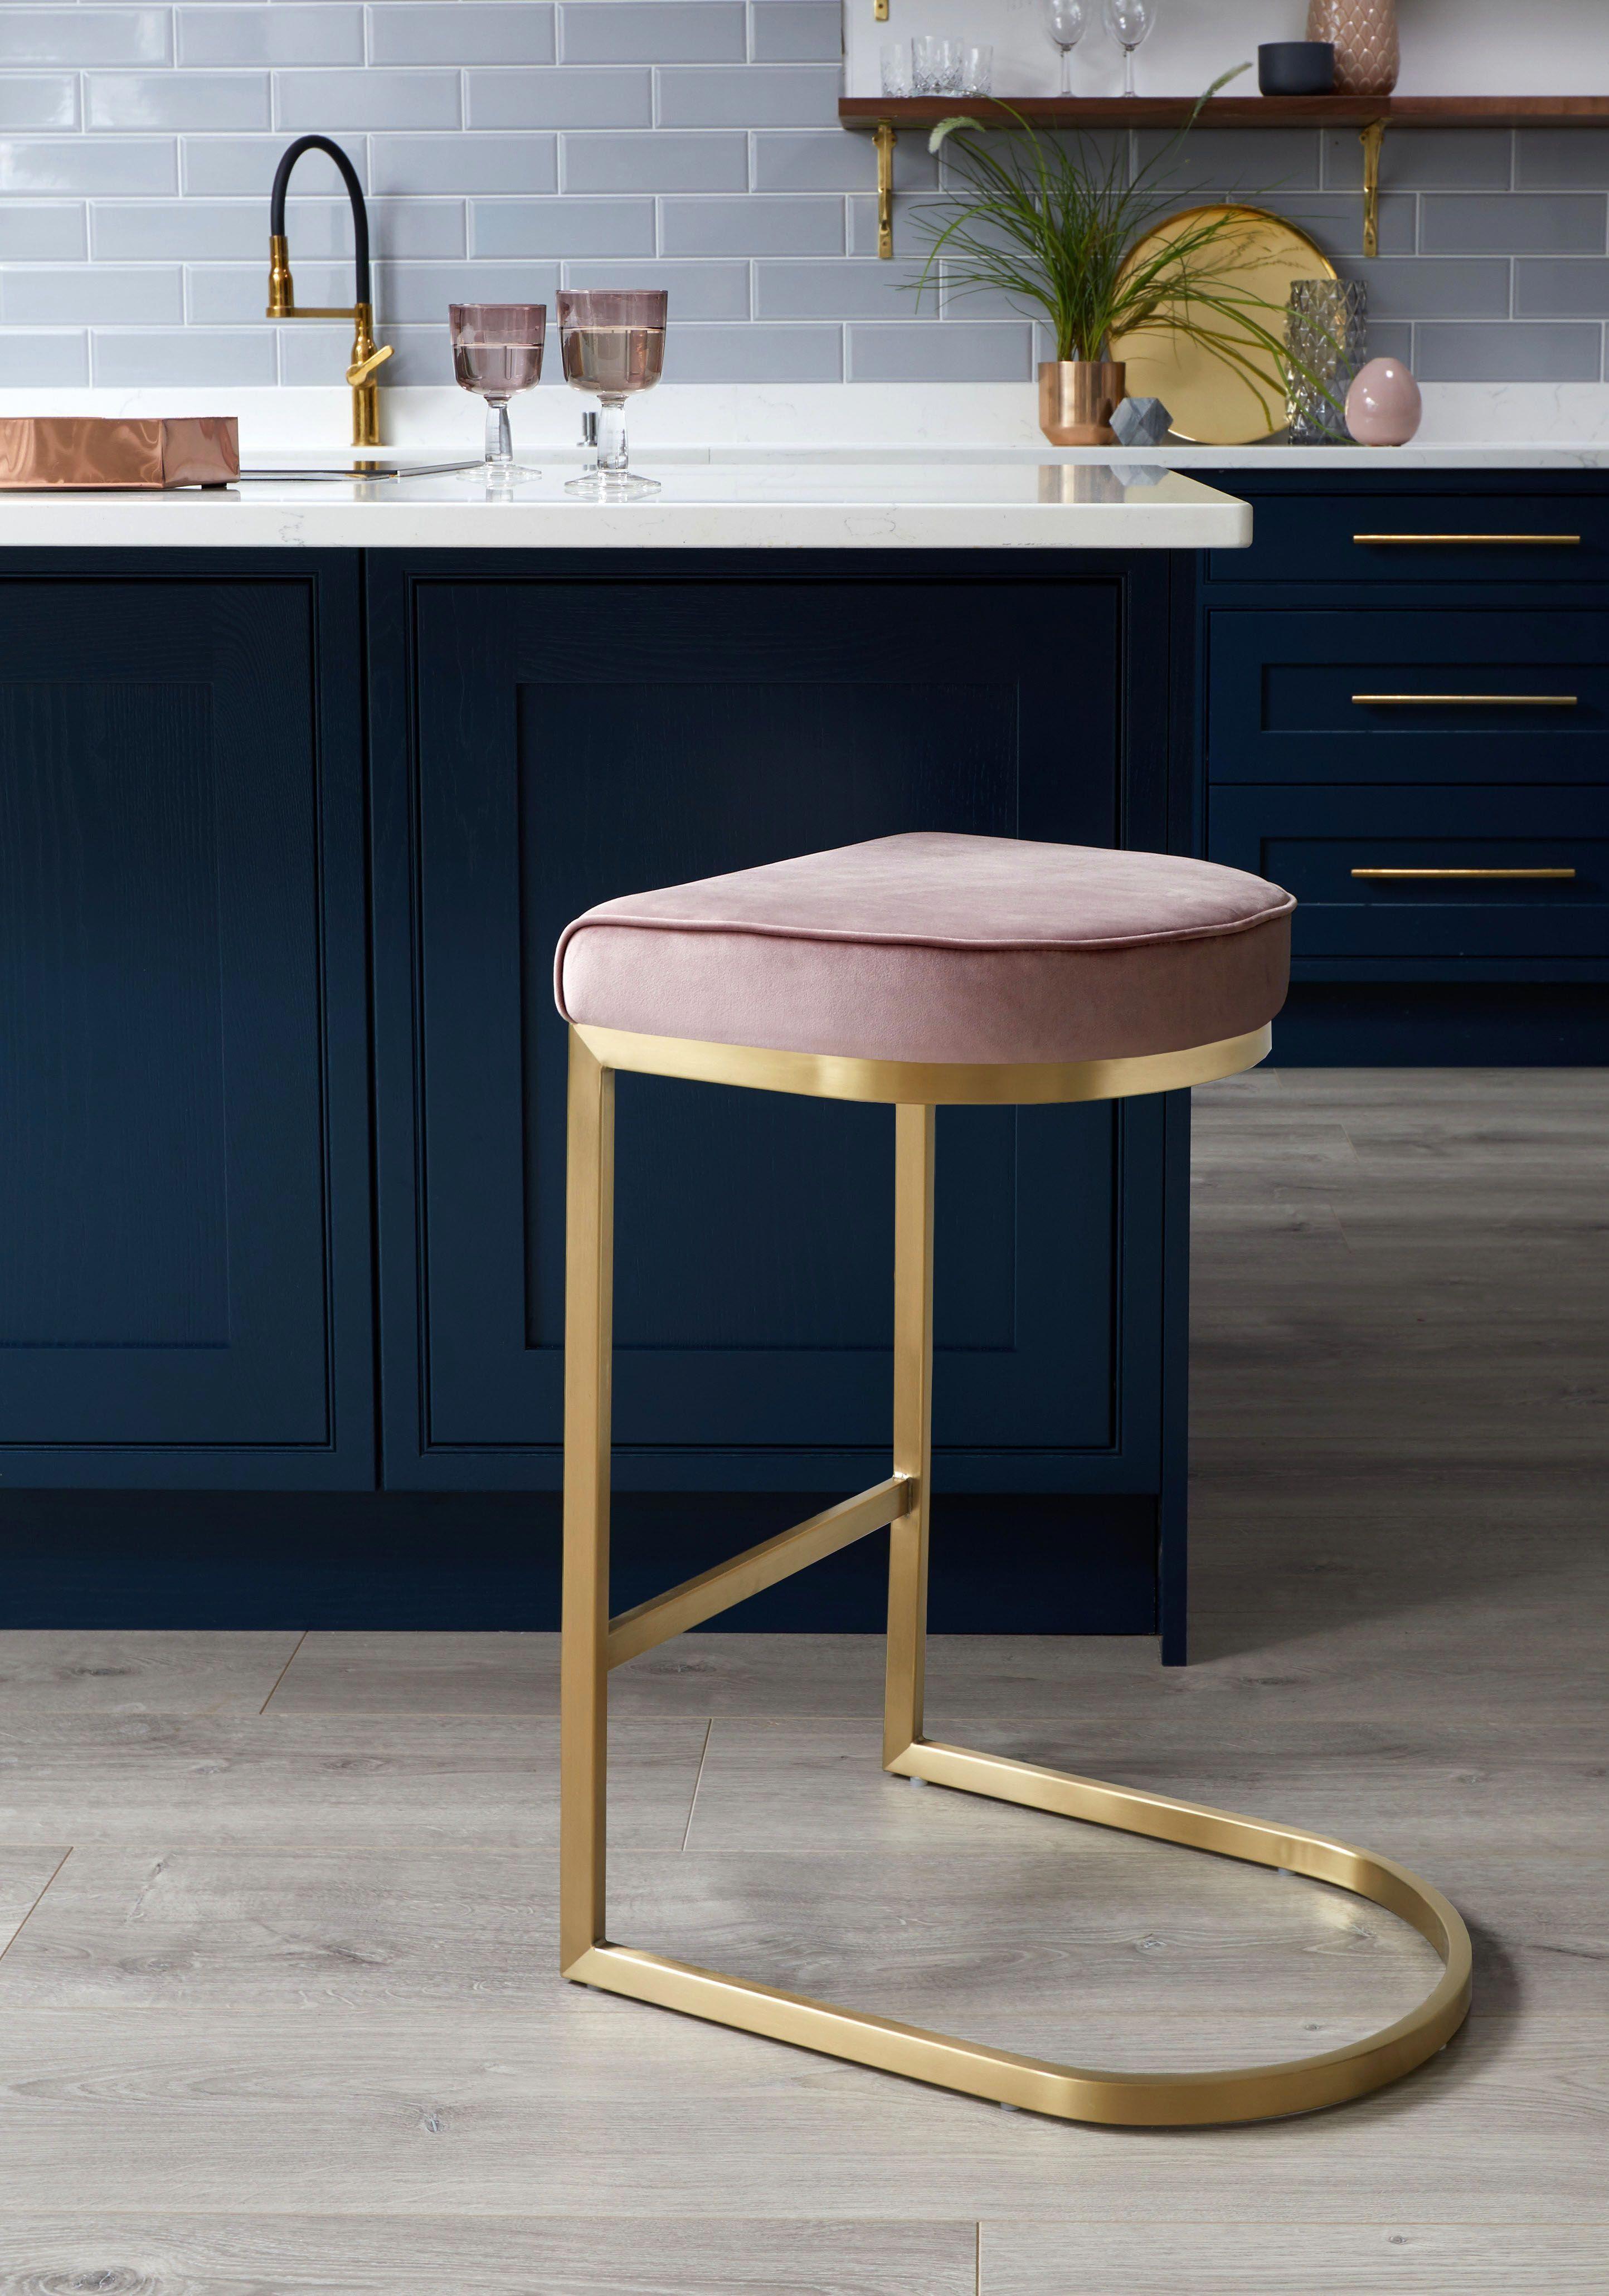 Furniturepick Kitchen Bar Stools Pink Bar Stools Blue And Pink Living Room